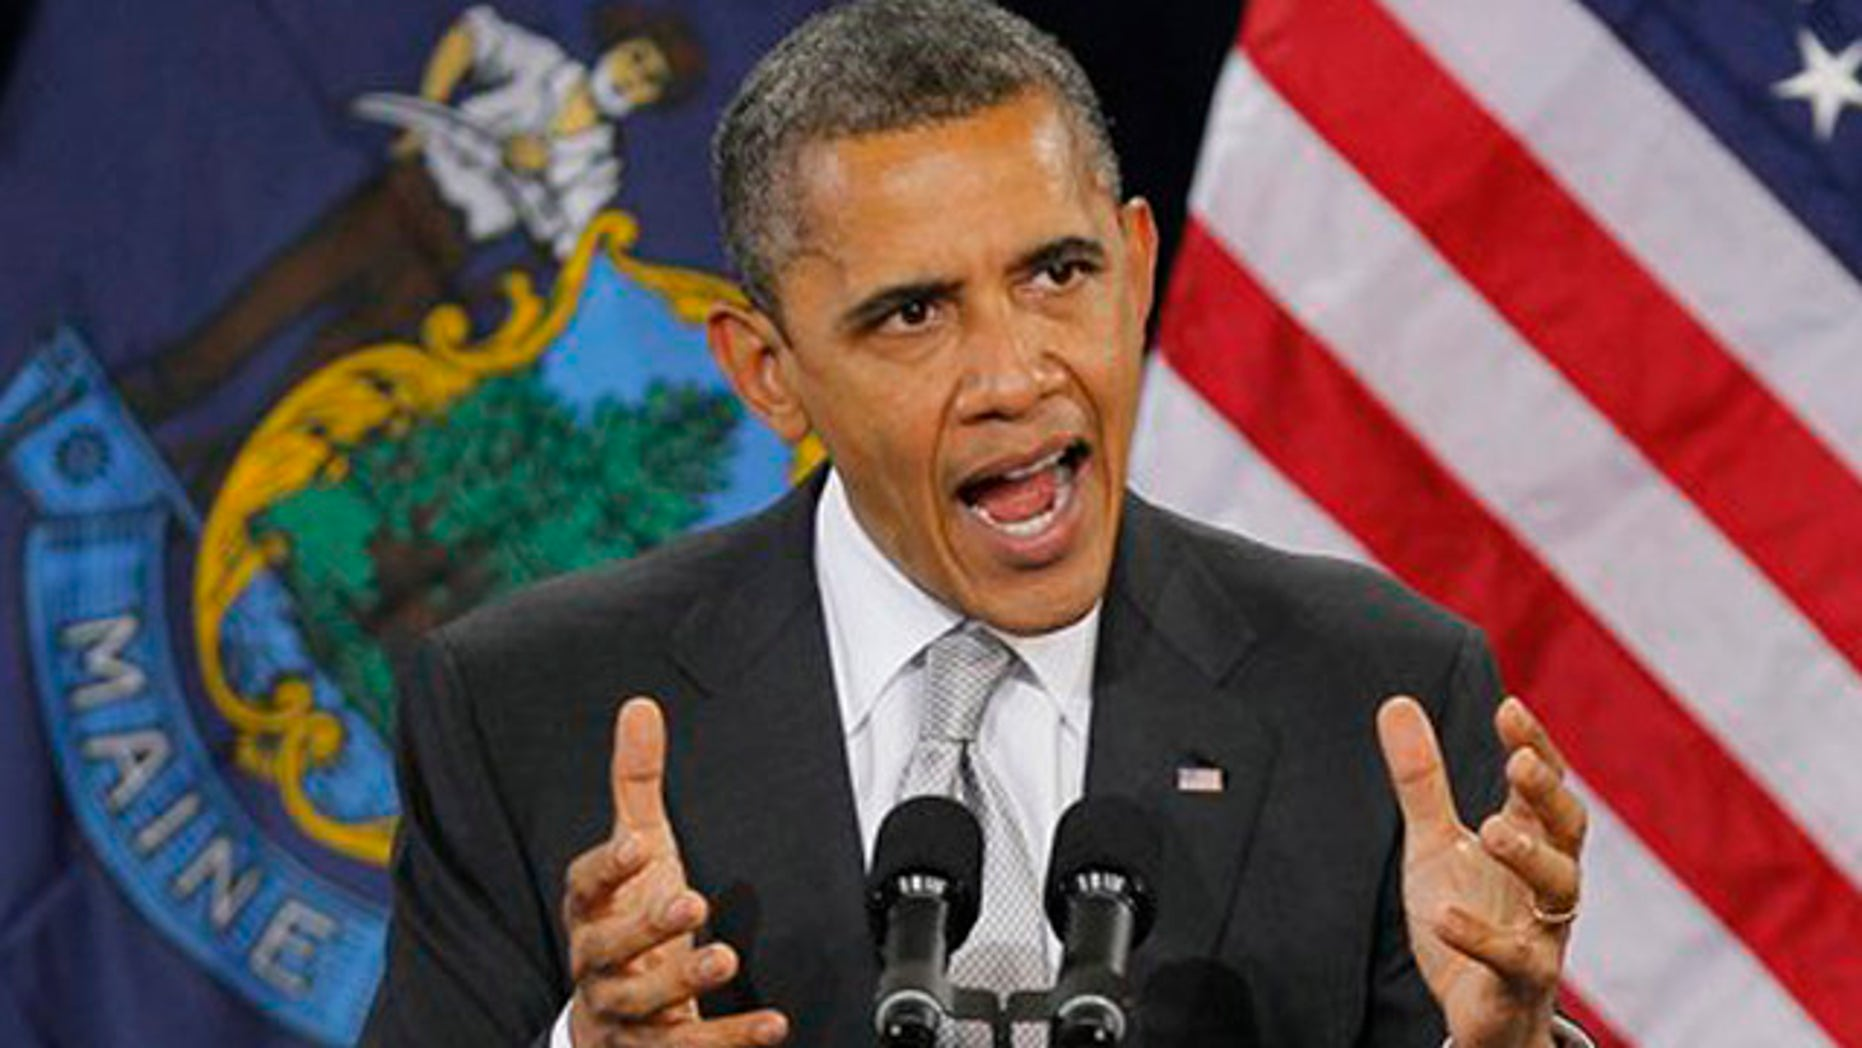 President Obama in Portland, Maine, March 20, 2012